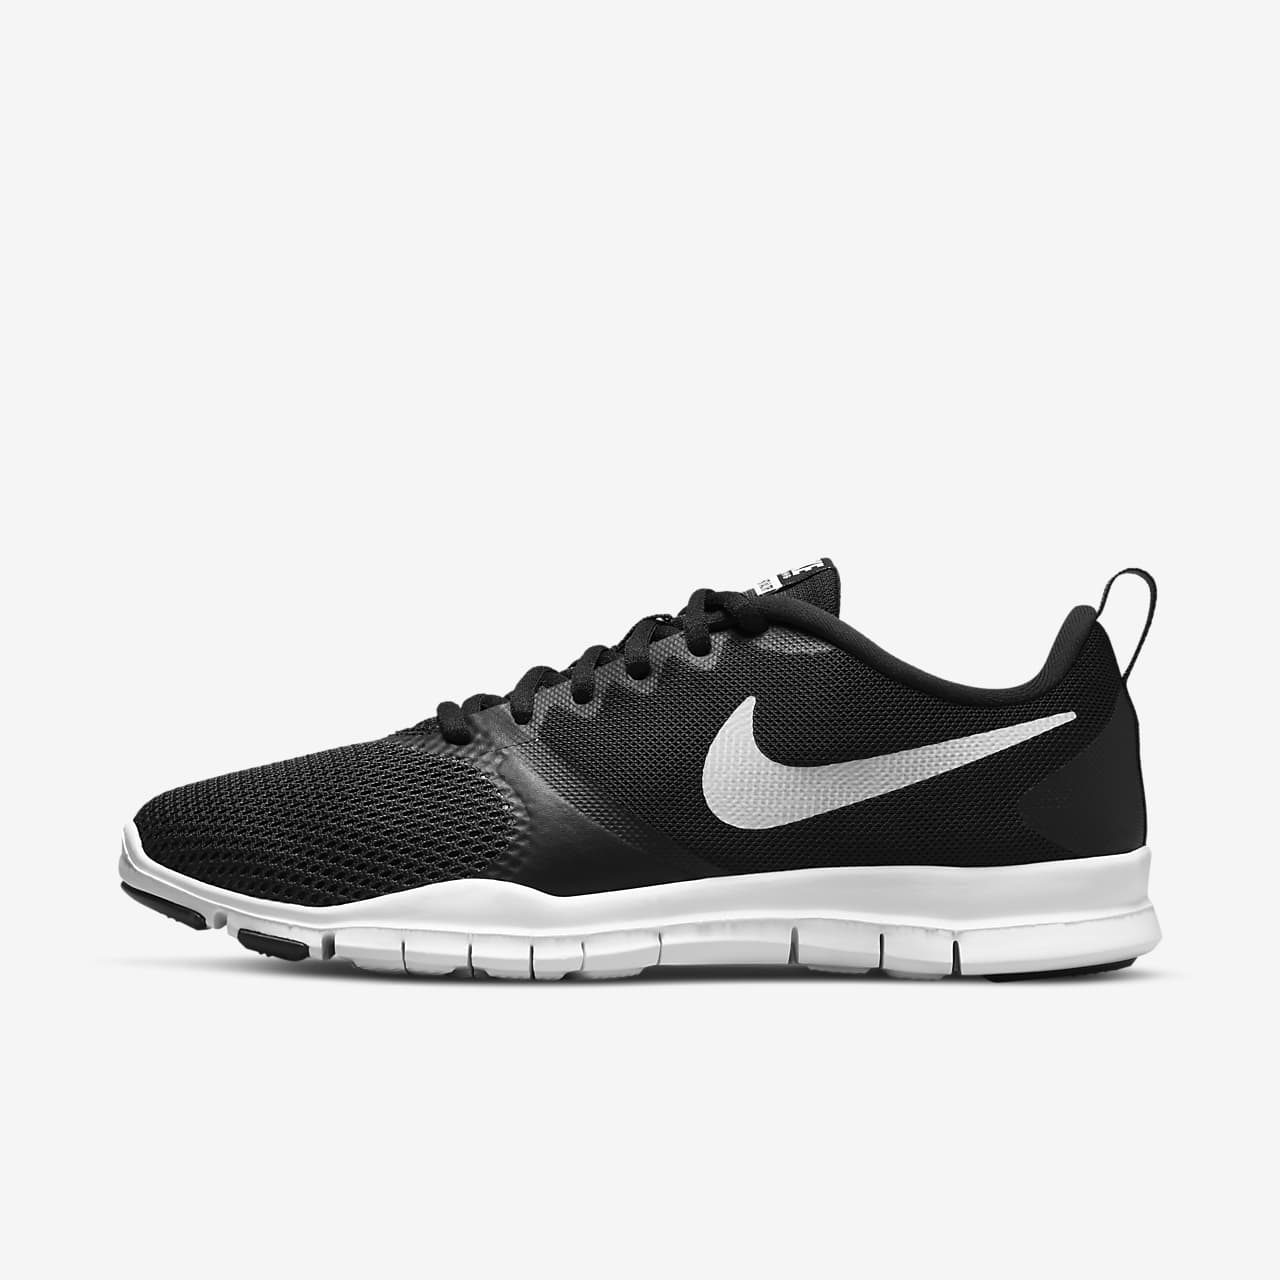 buy online 9a863 8cfd4 ... Scarpa da palestra allenamento fitness Nike Flex Essential TR - Donna